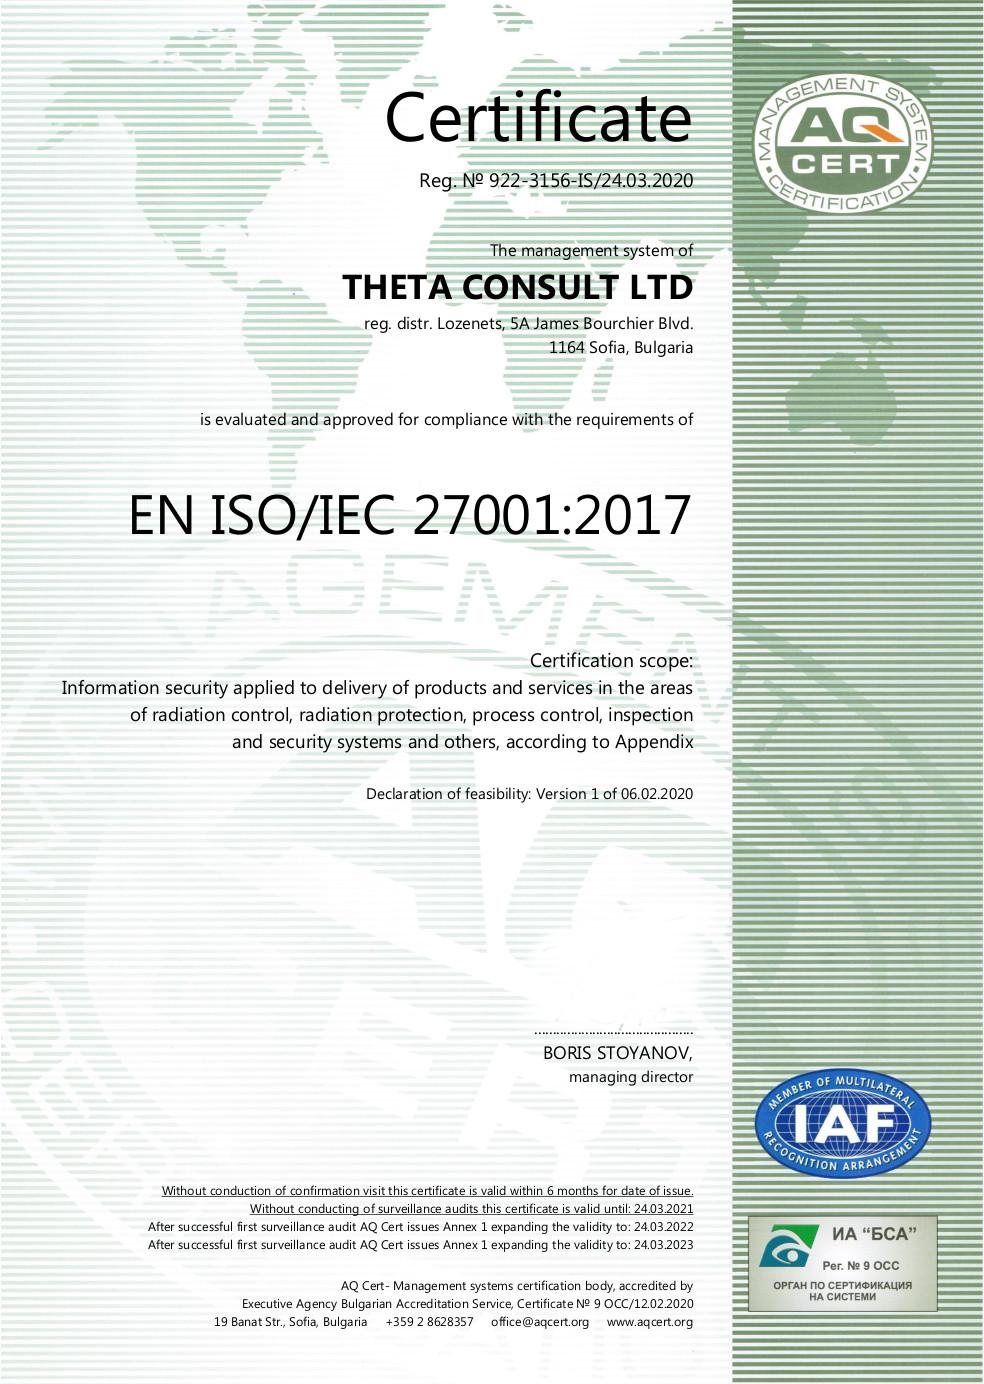 http://www.thetaconsult.com/wp-content/uploads/2021/01/Certificate-3156-TITA_KONSULT_OOD-EN.jpg